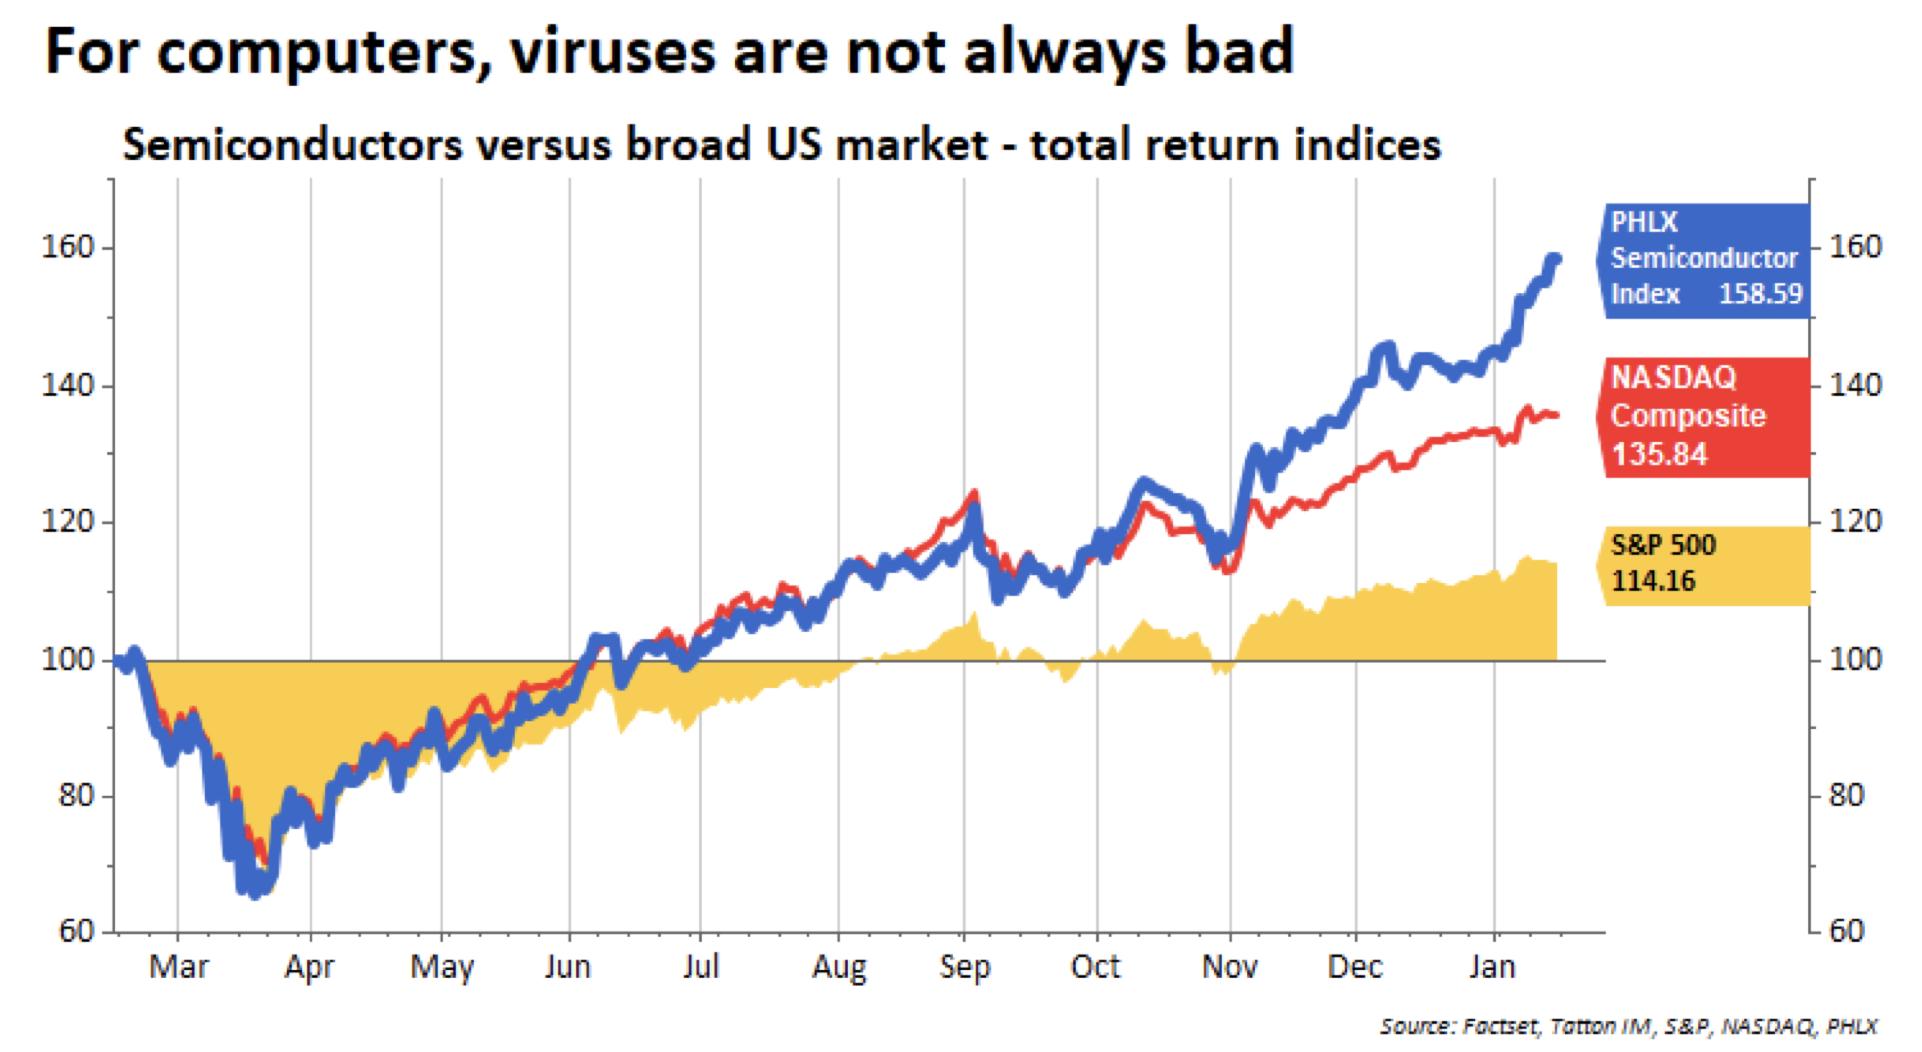 Semiconductors versus broad US market - total return indices